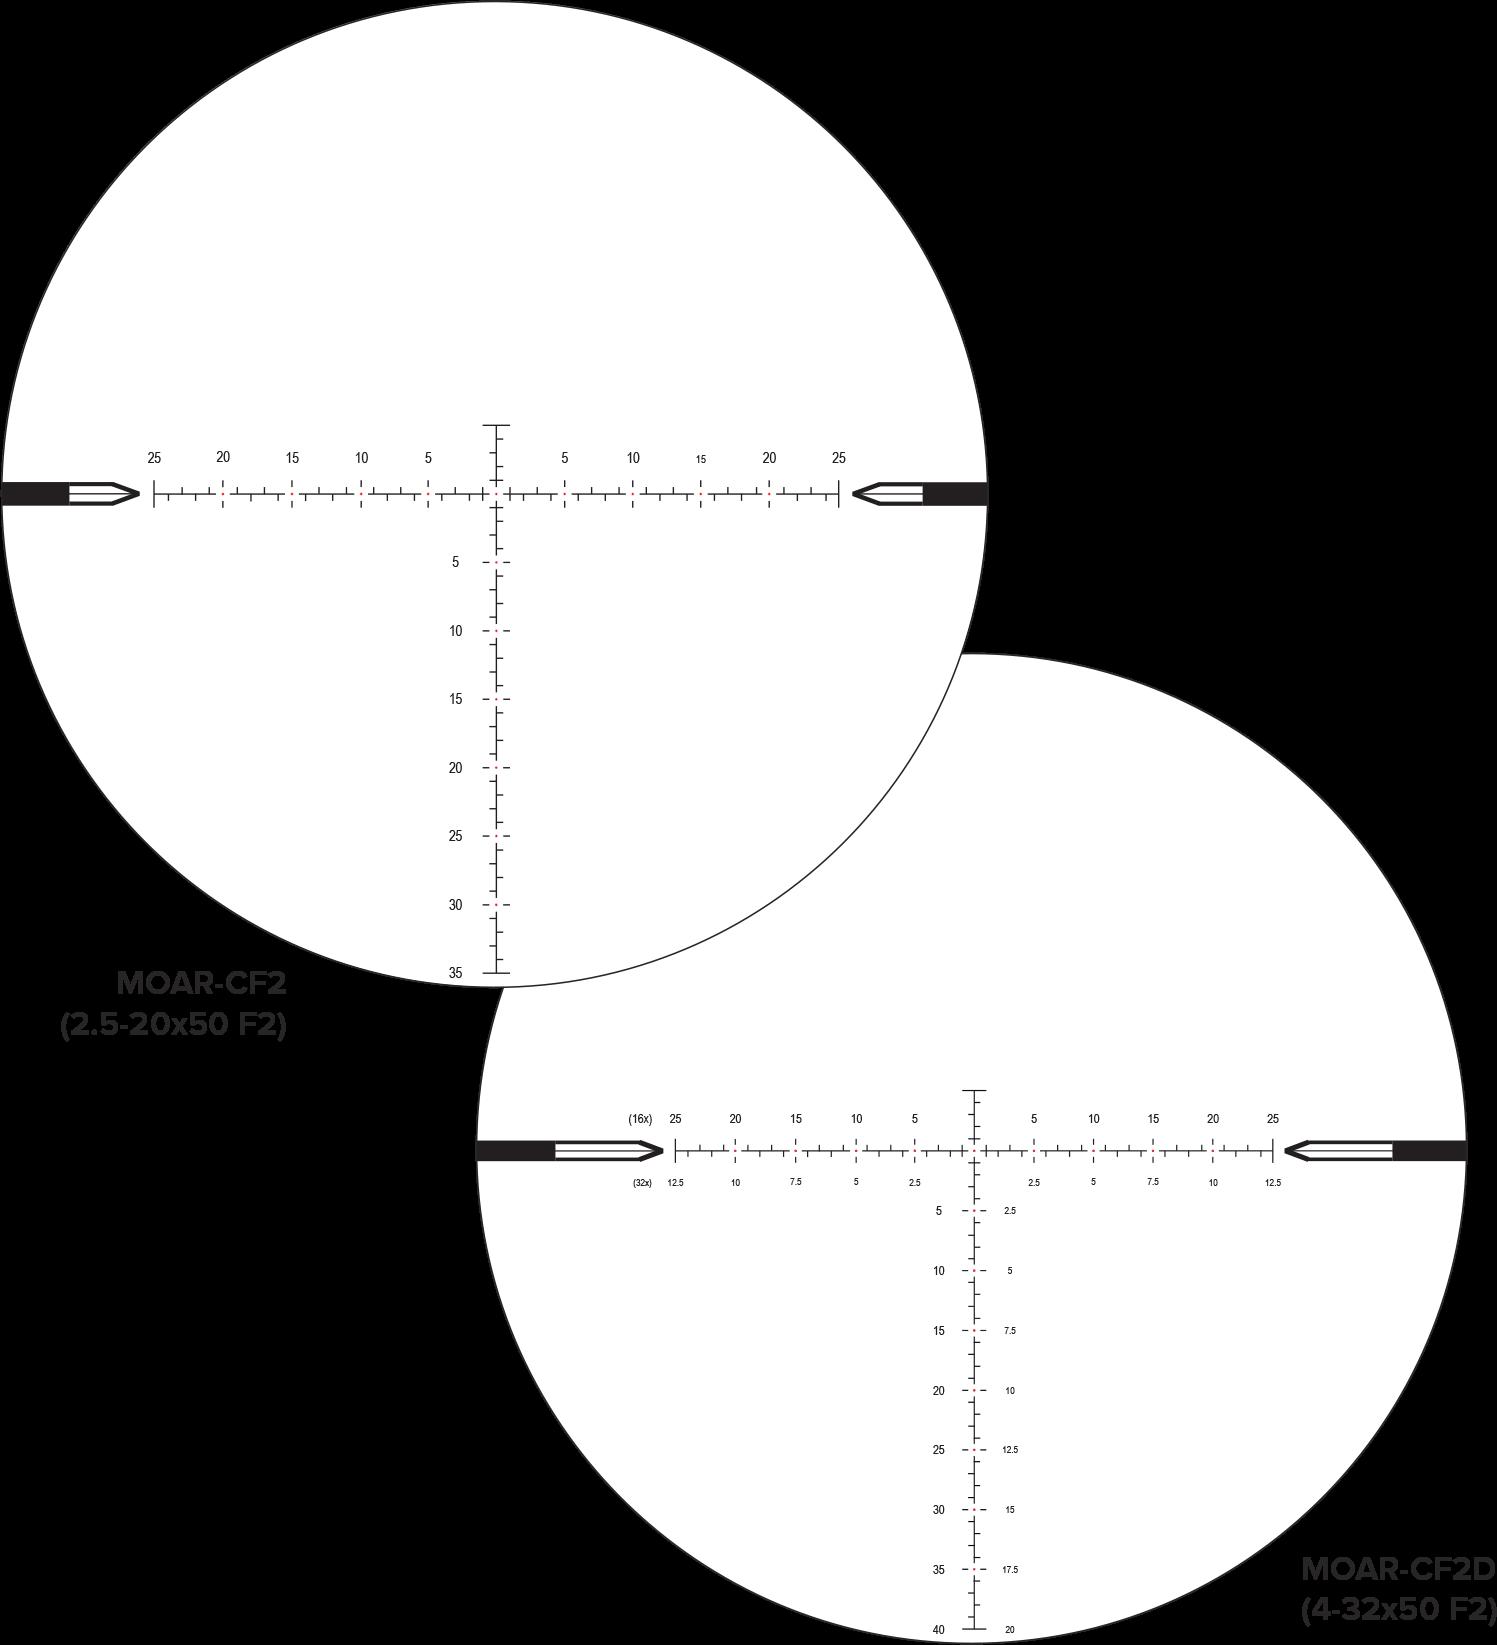 Reticle_Images - MOAR-CF2_MOARCF2D_Combined